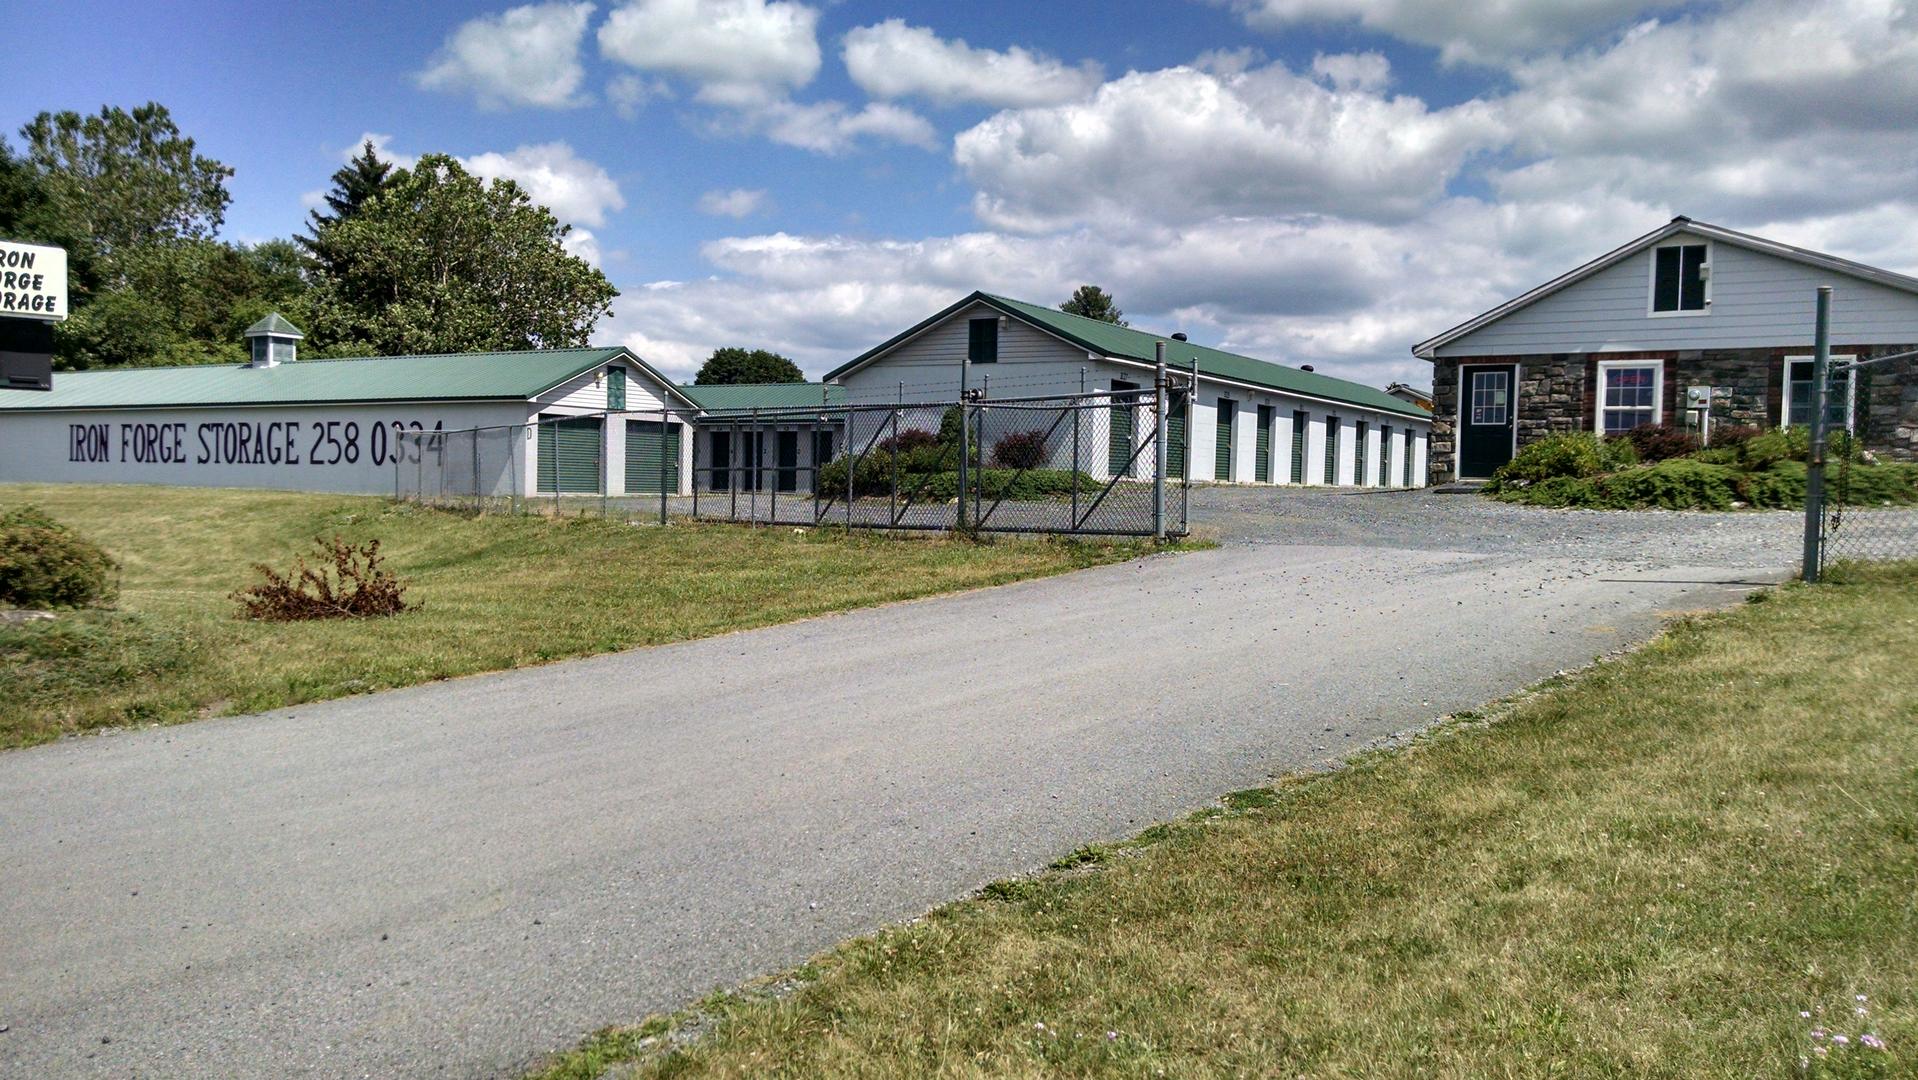 Storage Units in Carlisle, PA